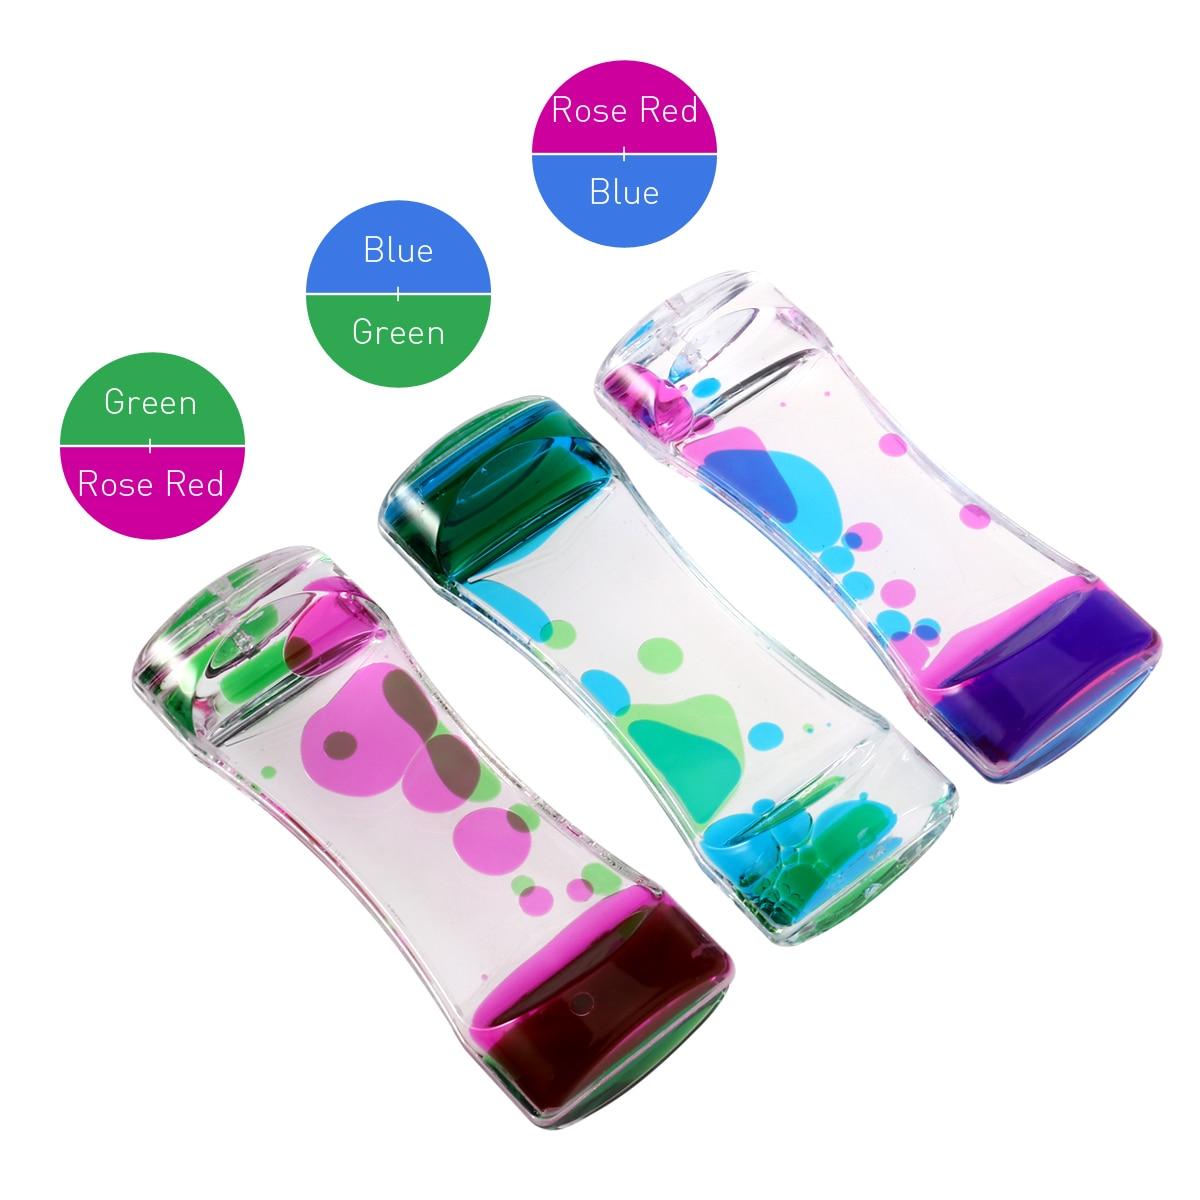 BESTOMZ 3pcs Double Colors Oil Hourglass Liquid Motion Bubble Timer with Pretty Waist Desk Decor Birthday Gift Children Toy